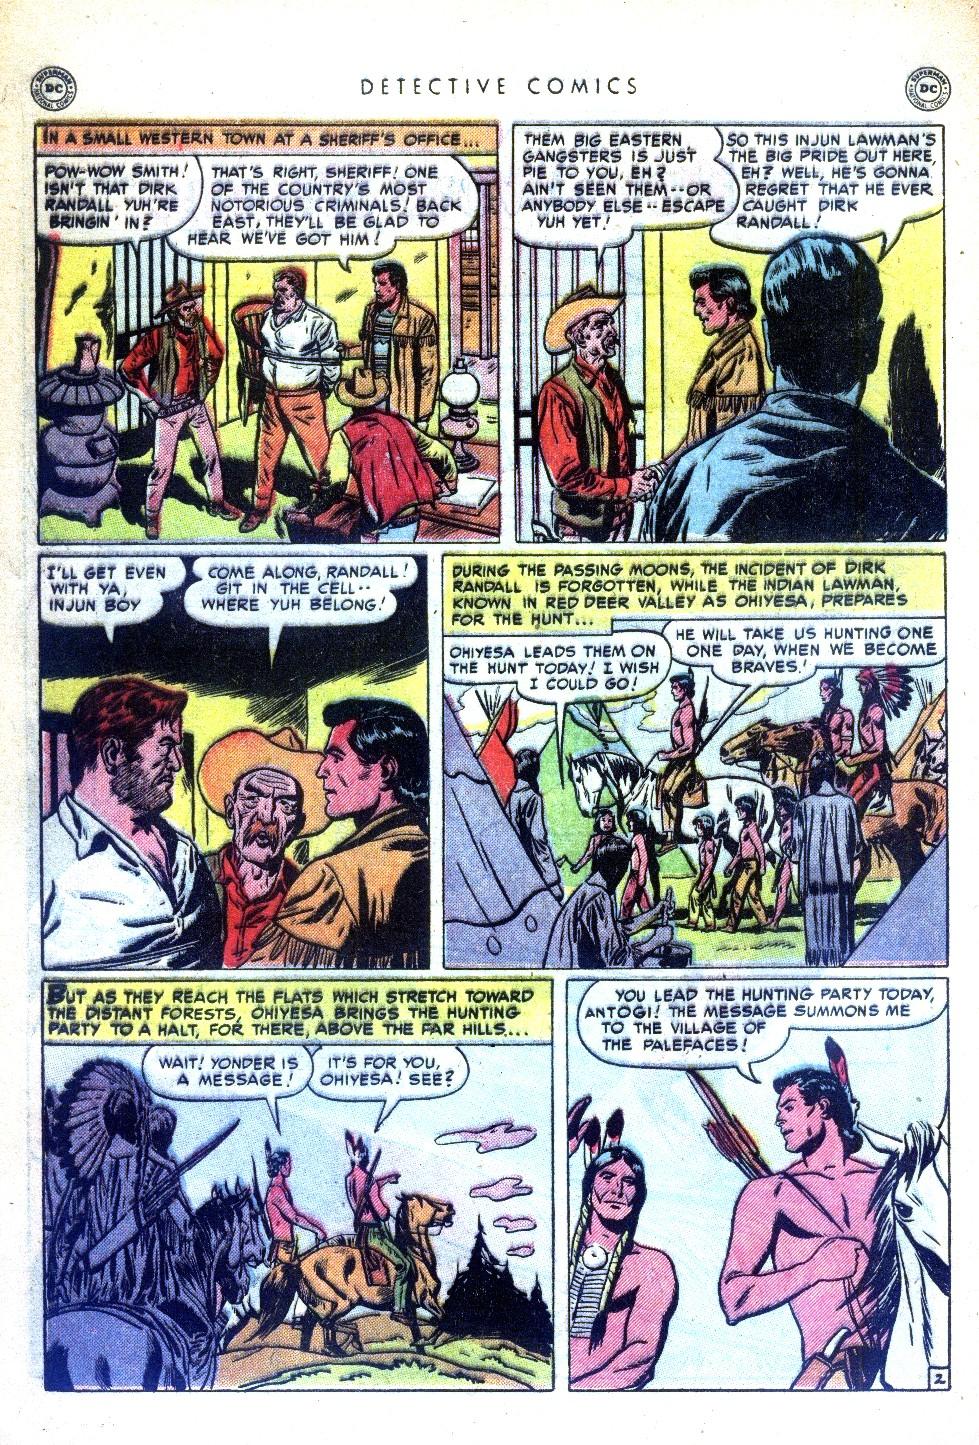 Read online Detective Comics (1937) comic -  Issue #169 - 40